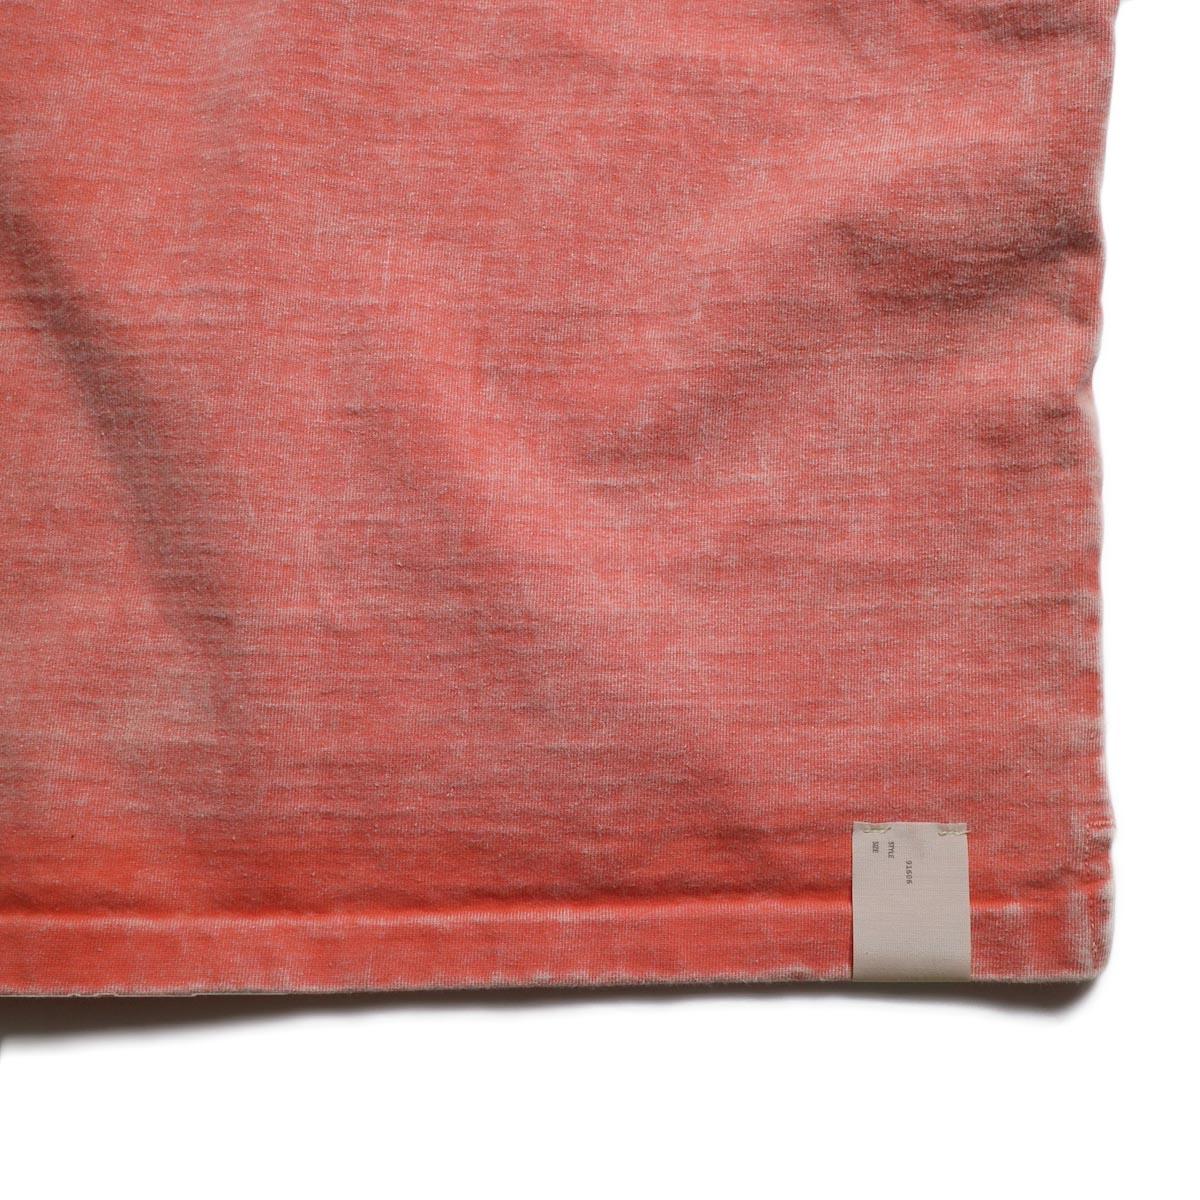 N.HOOLYWOOD × Gramicci  / 191-CS27-024 Short Sleeve Tee -Pink タグ